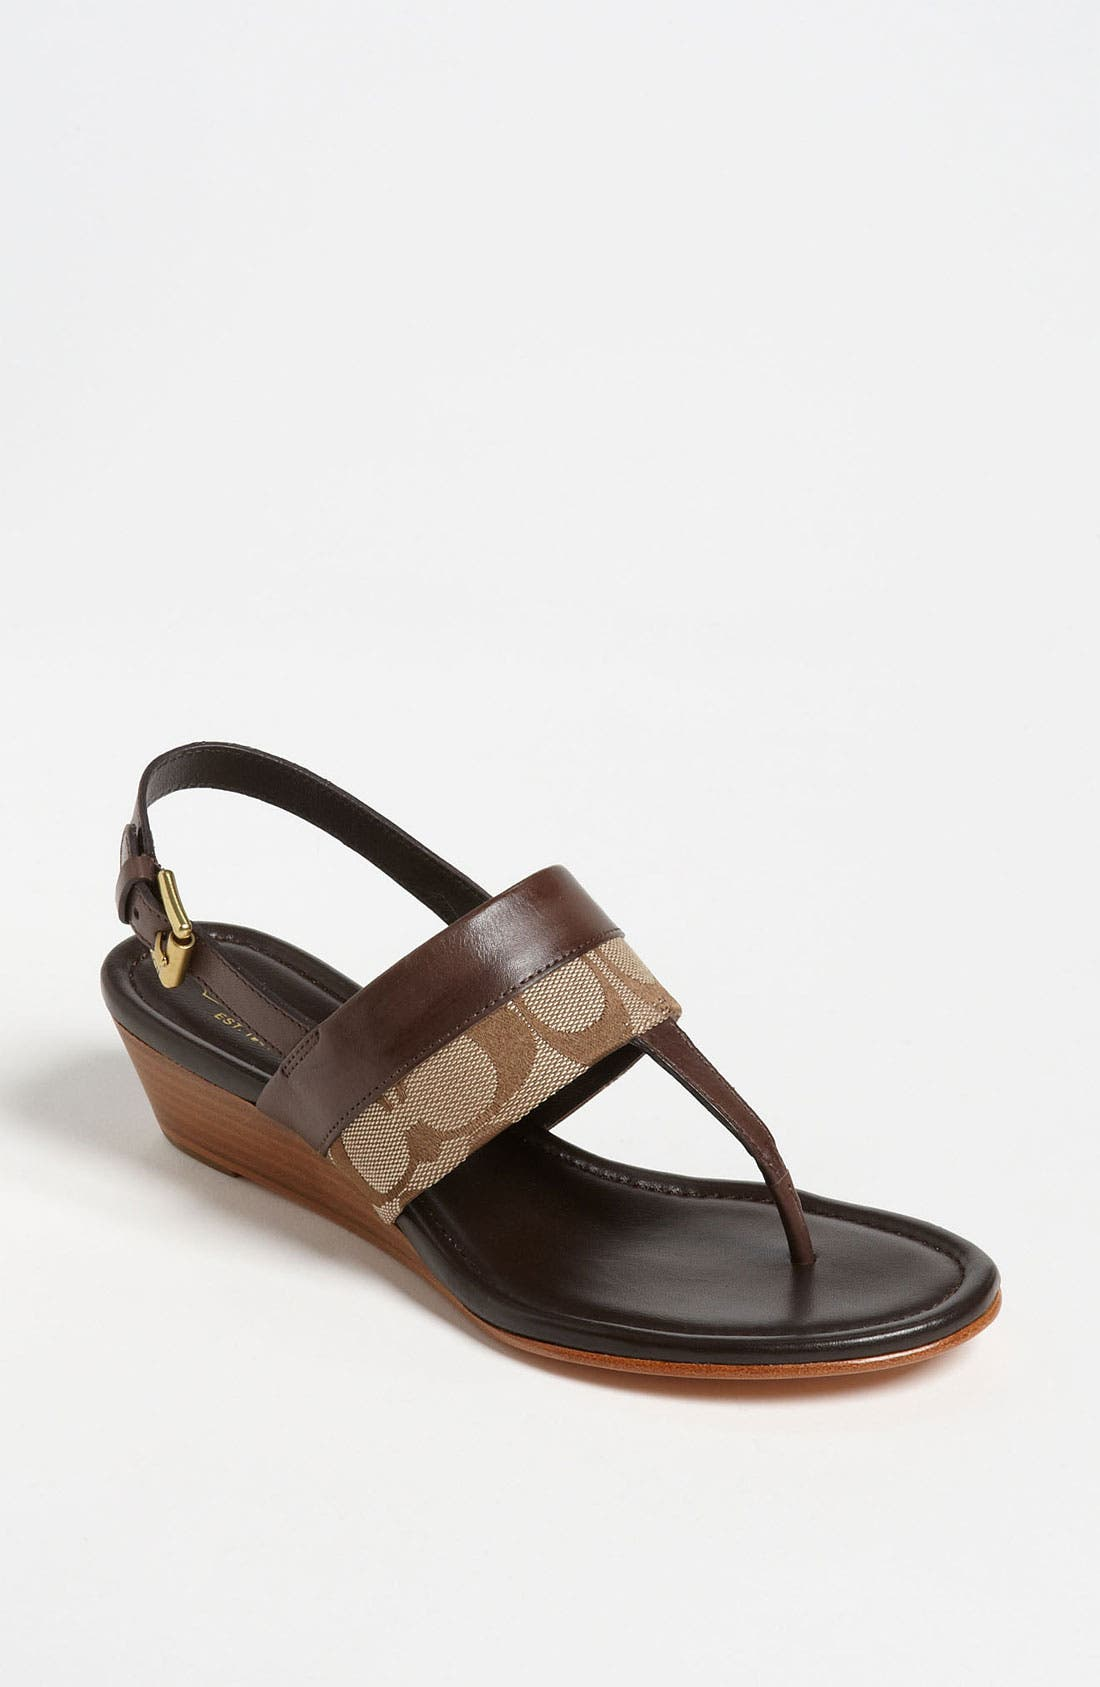 Alternate Image 1 Selected - COACH 'Violett' Sandal